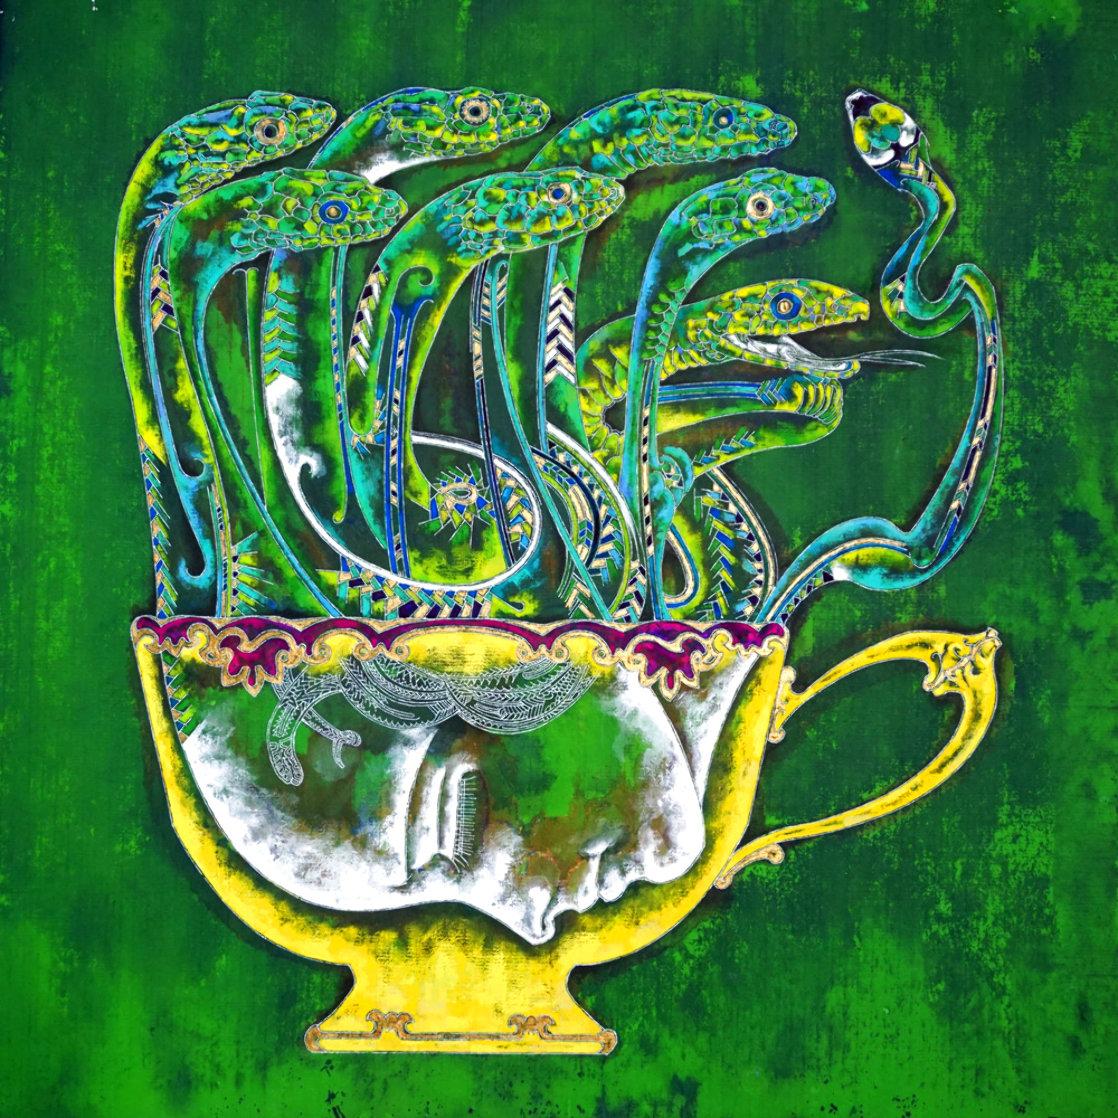 Medusa in the Tea Cup 2020 20x20 Original Painting by Lu Hong